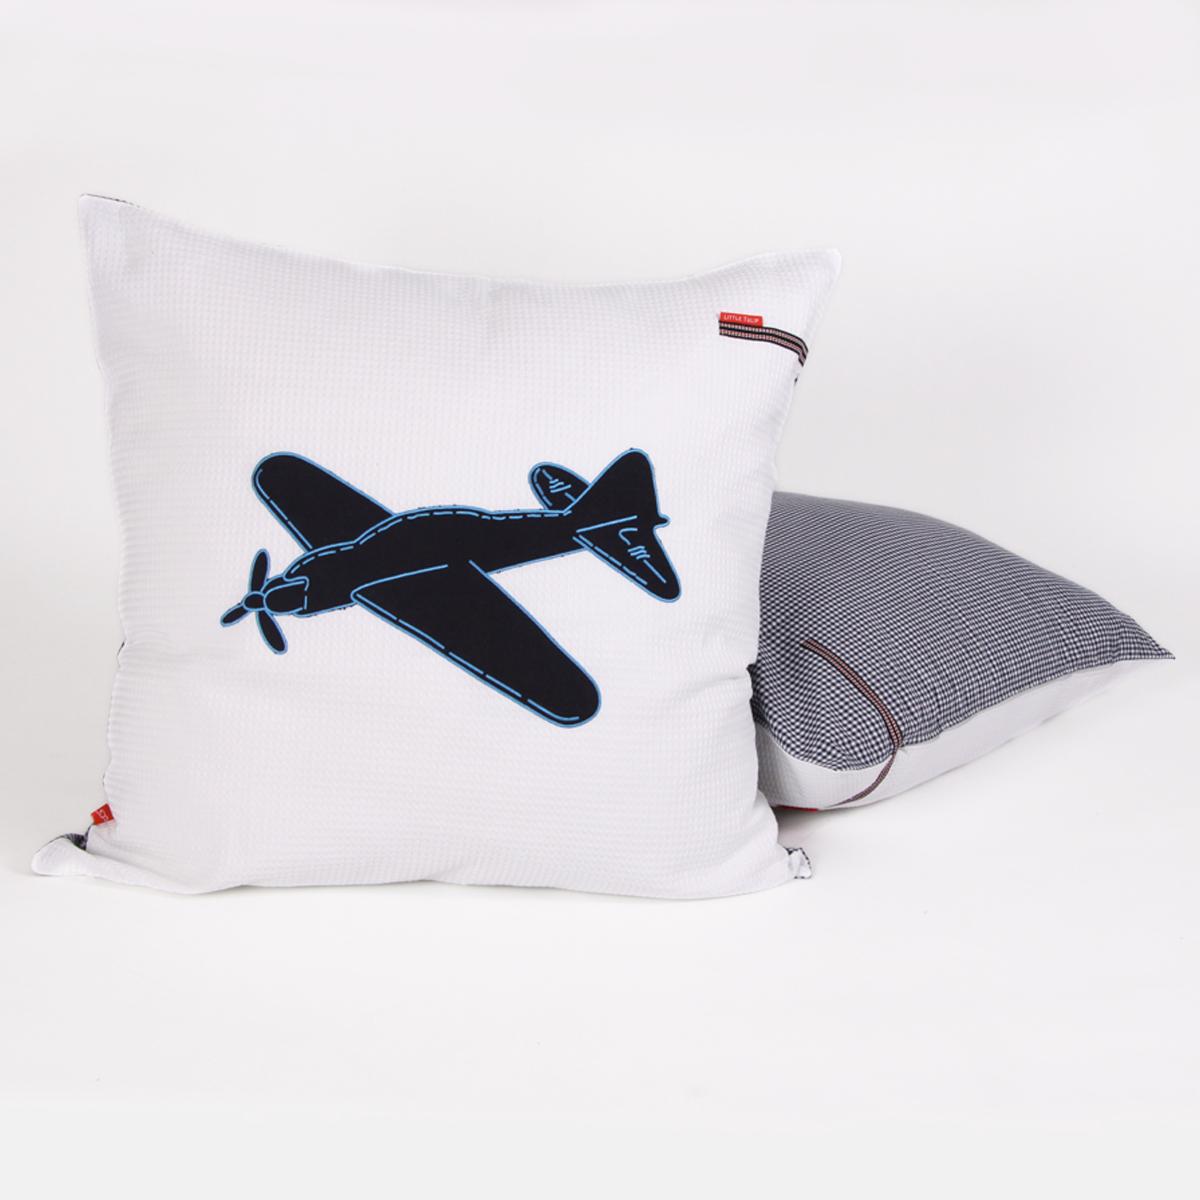 Little Tulip eco loungekussen vliegtuig voertuigen dekbed laken plane bed blauw wit marine babykamer meisje jongen unisex babyuitzet kinderkamer steigerhout woonkamer woonaccessoire accessoire